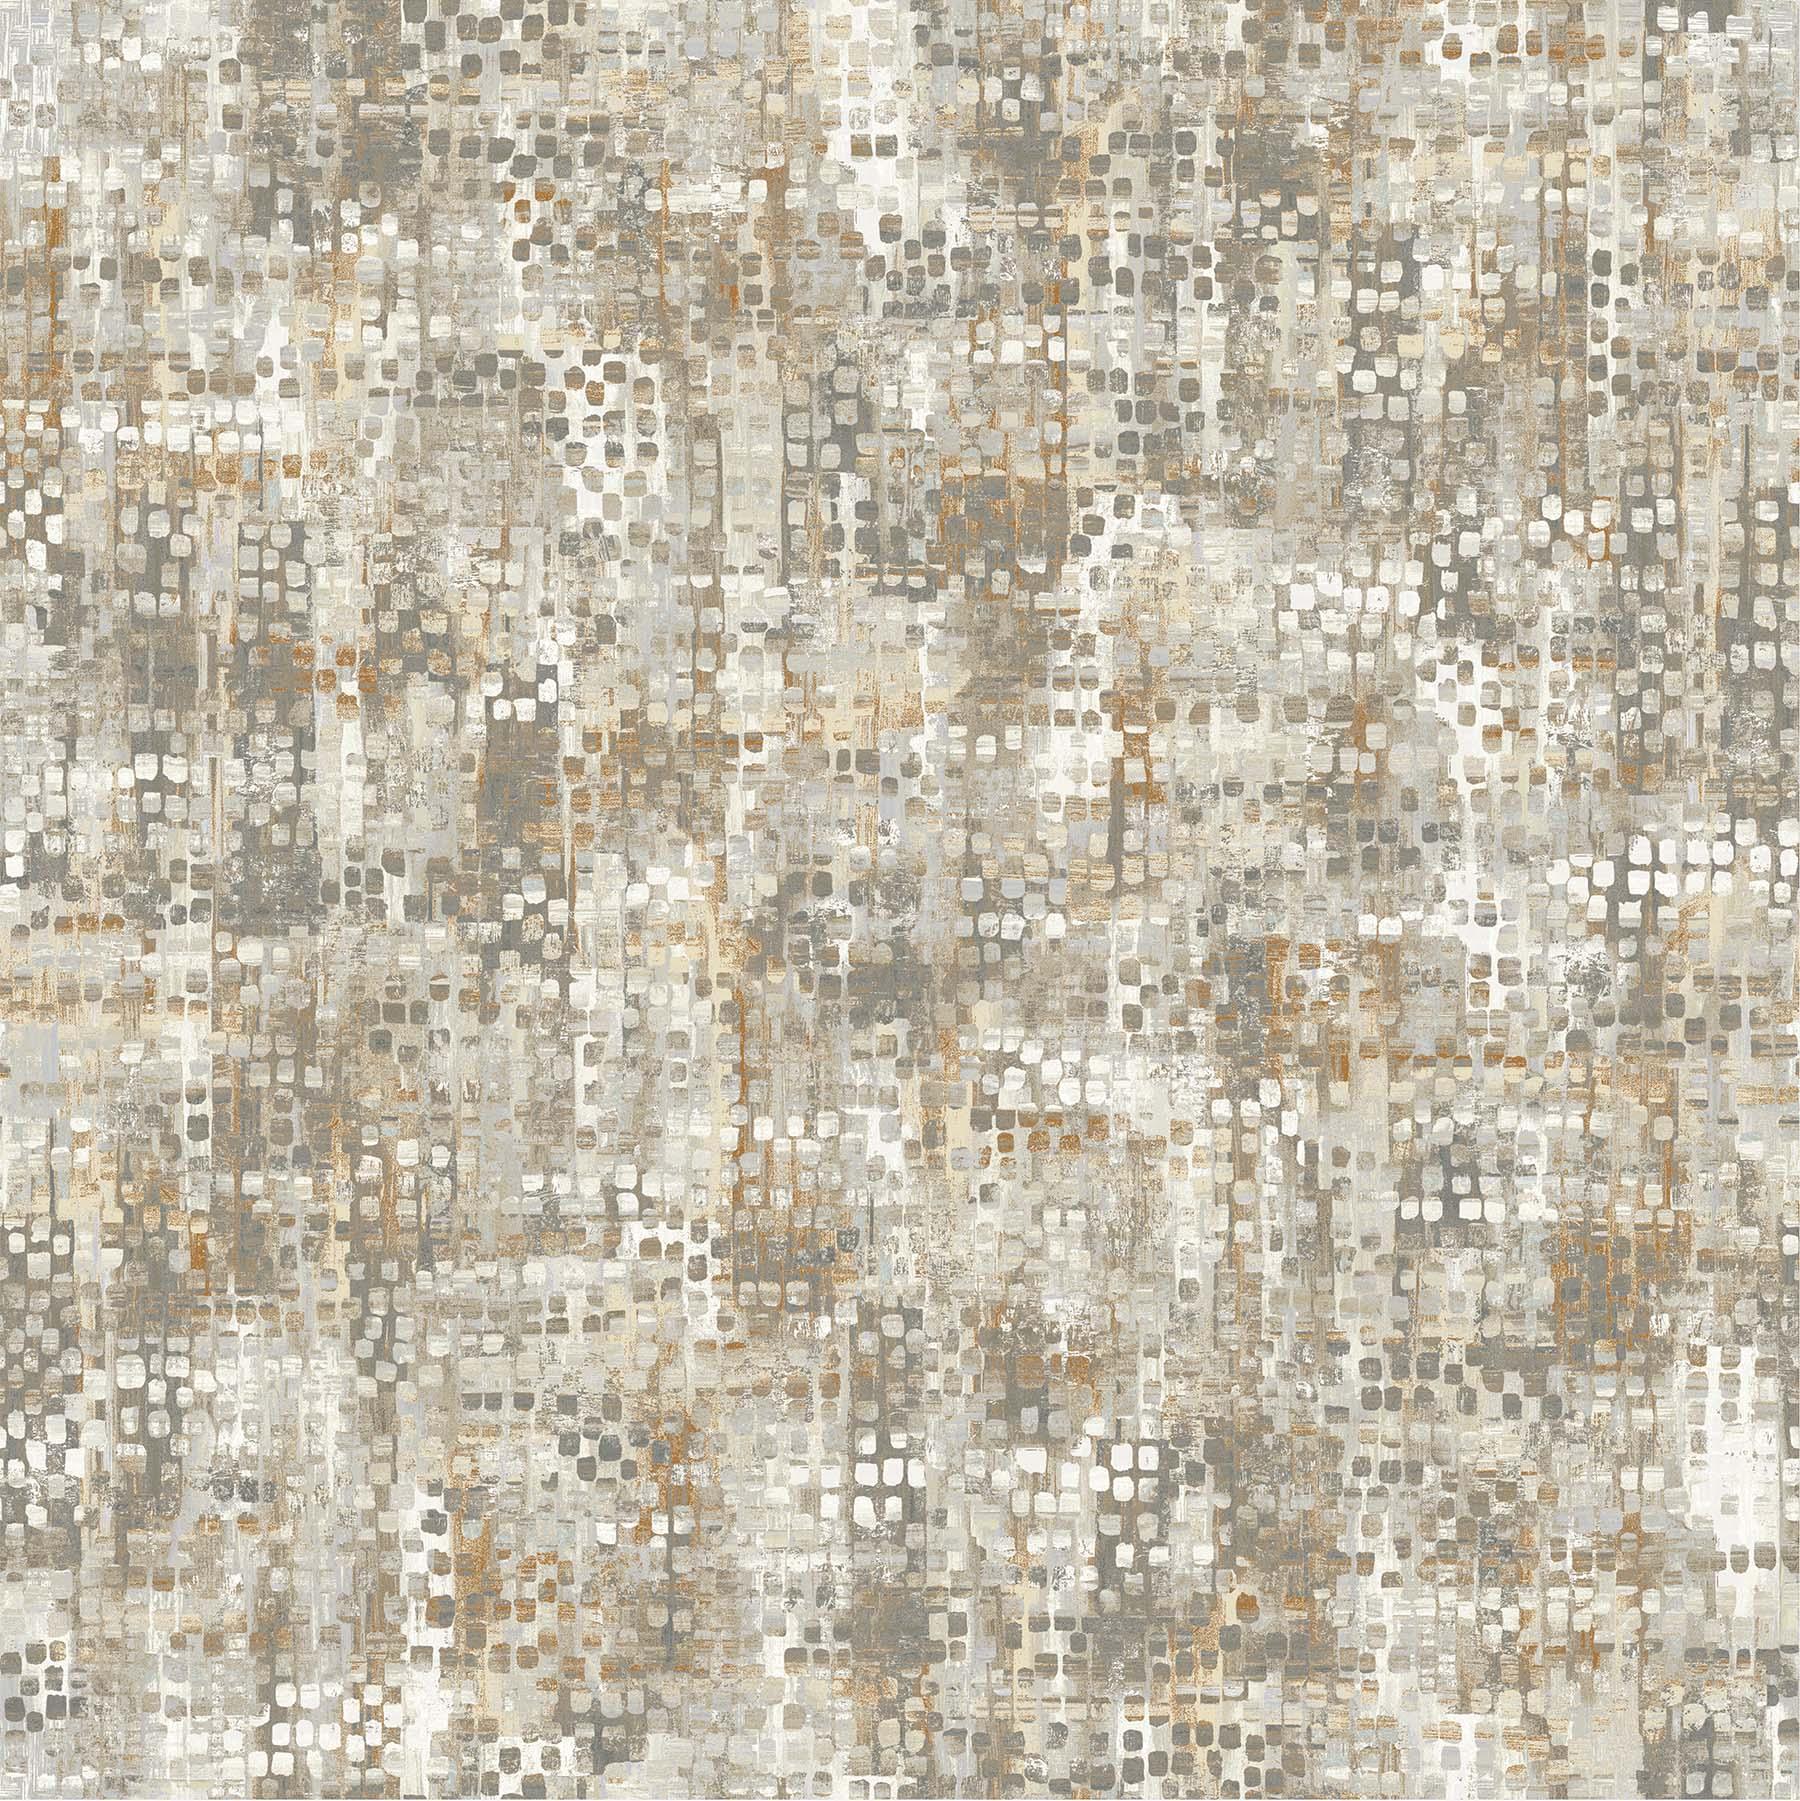 OPHELIA GRAY BEIGE - 23953-34 - 1/3 yd